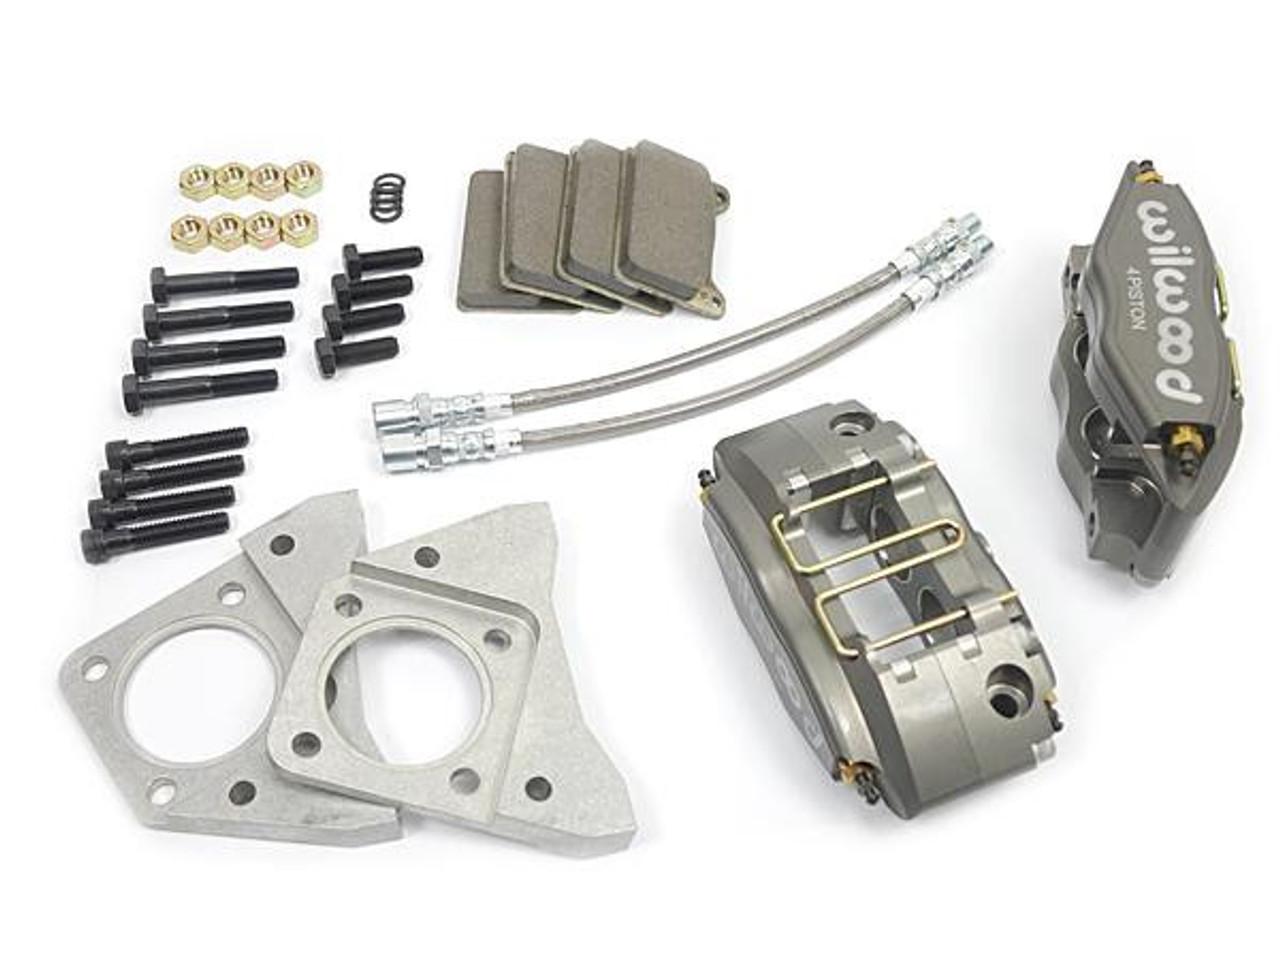 Wilwood big brake caliper kit for stock size brake rotors FIAT 124 Spider, Sport Coupe, Spider 2000 and Pininfarina - 1966-1985 - Auto Ricambi